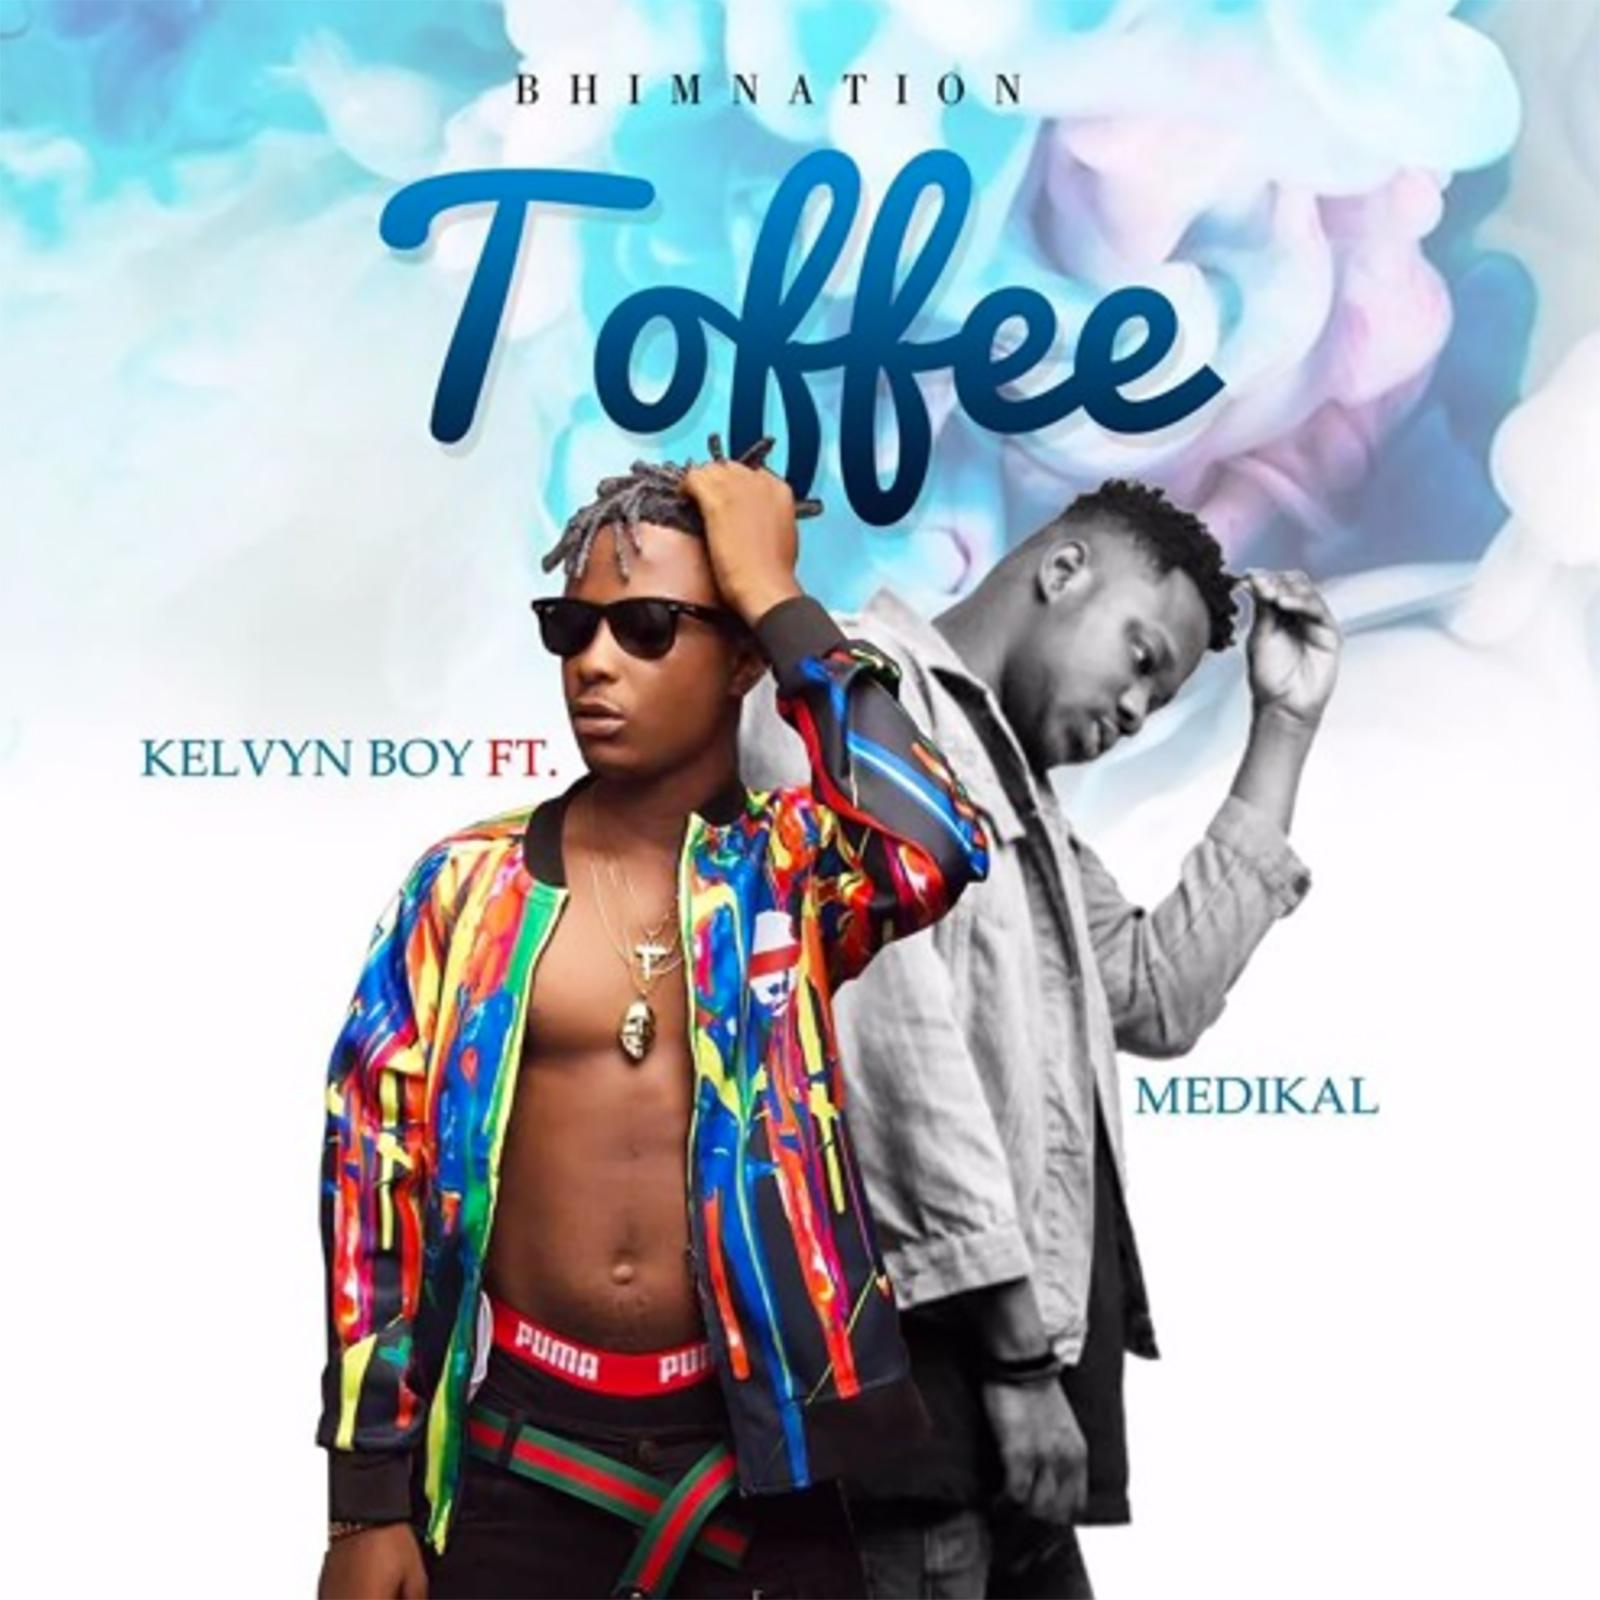 Toffee by Kelvyn Boy feat. Medikal